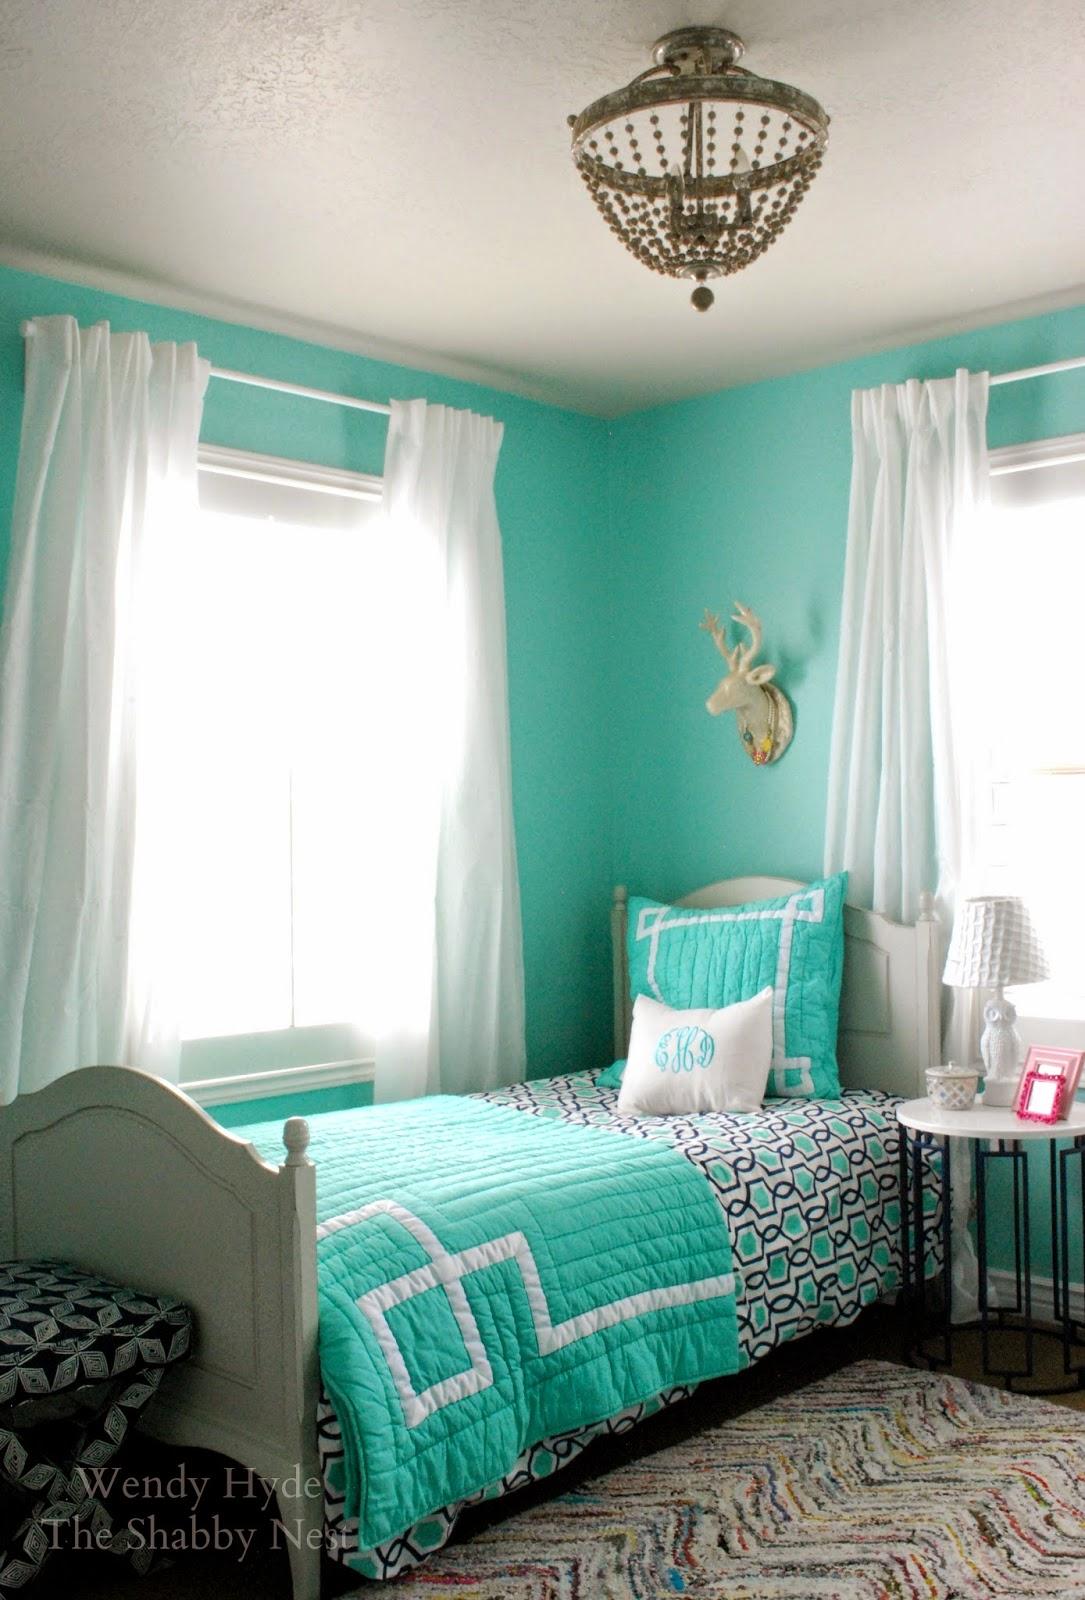 The Shabby Nest: One Room Challenge: The Teen Girl's Bedroom REVEAL~